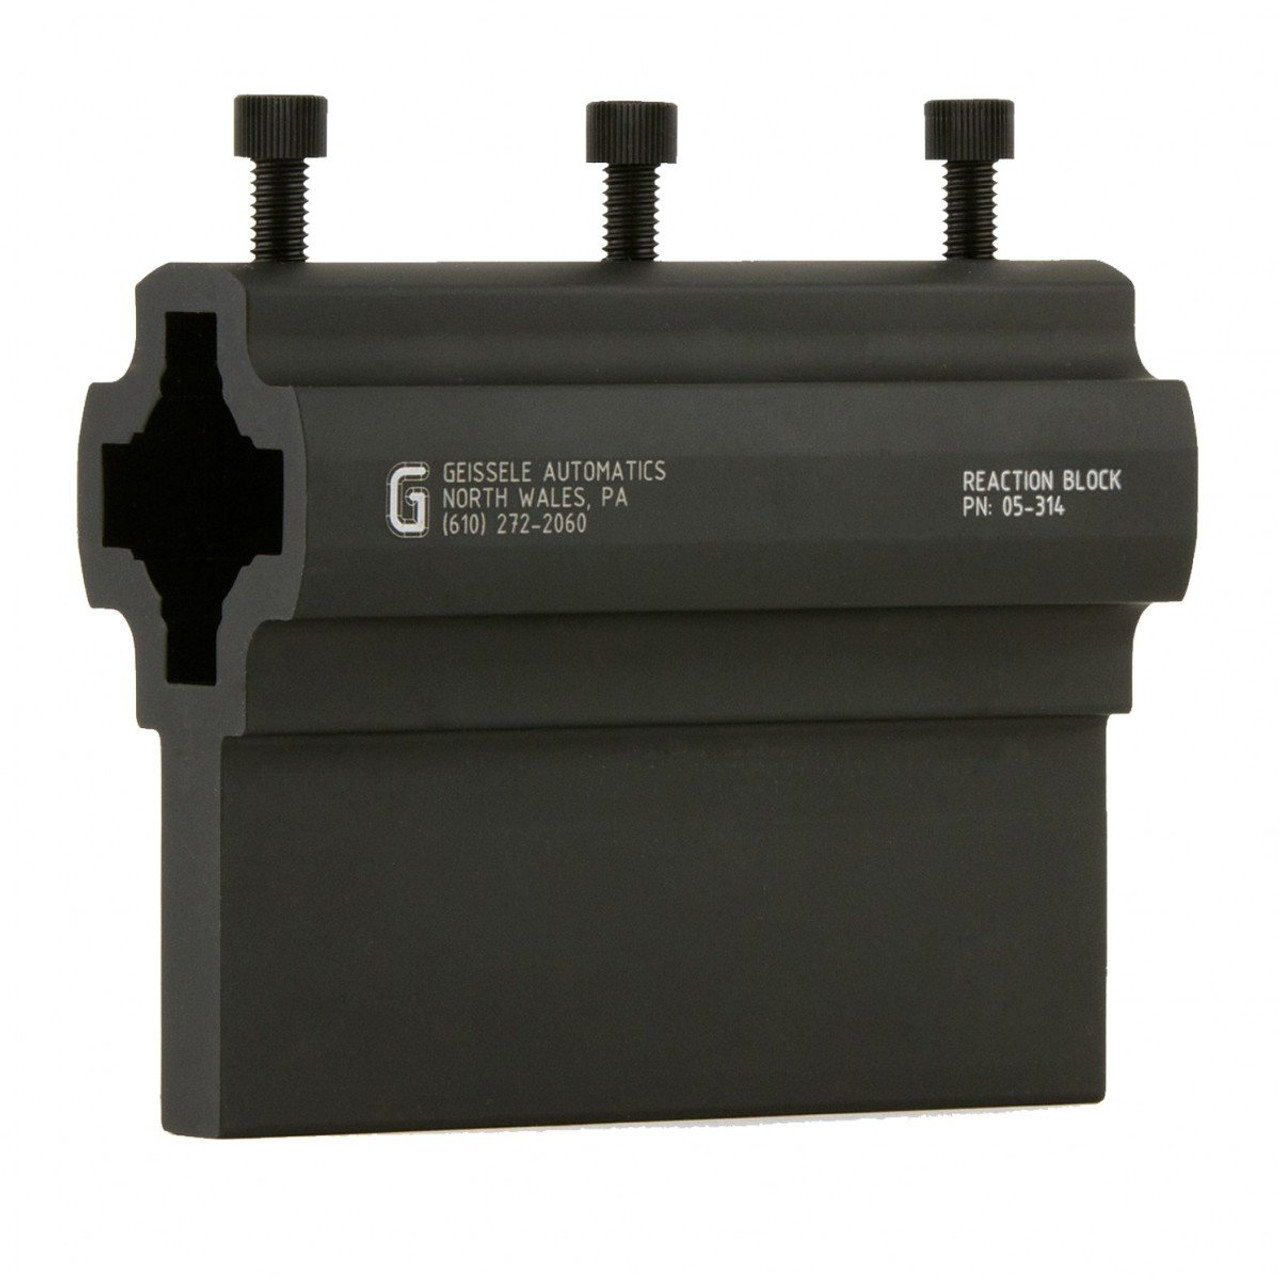 Geissele AR15/M4 Reaction Block - Armorer's Tool